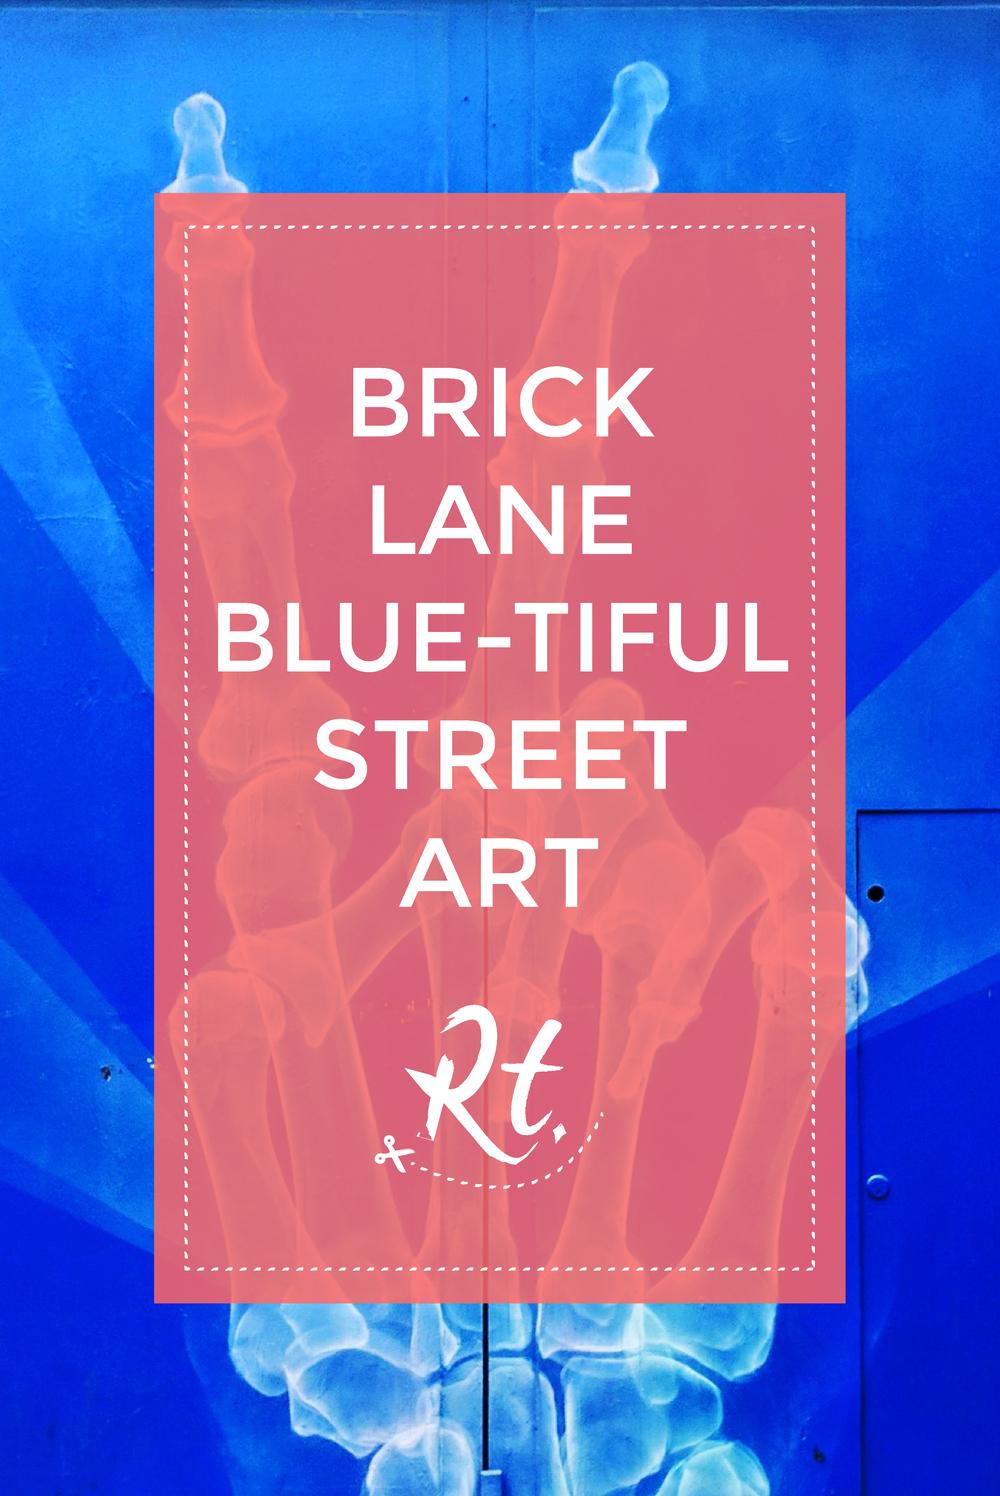 Brick Lane Street Art, Shok-1